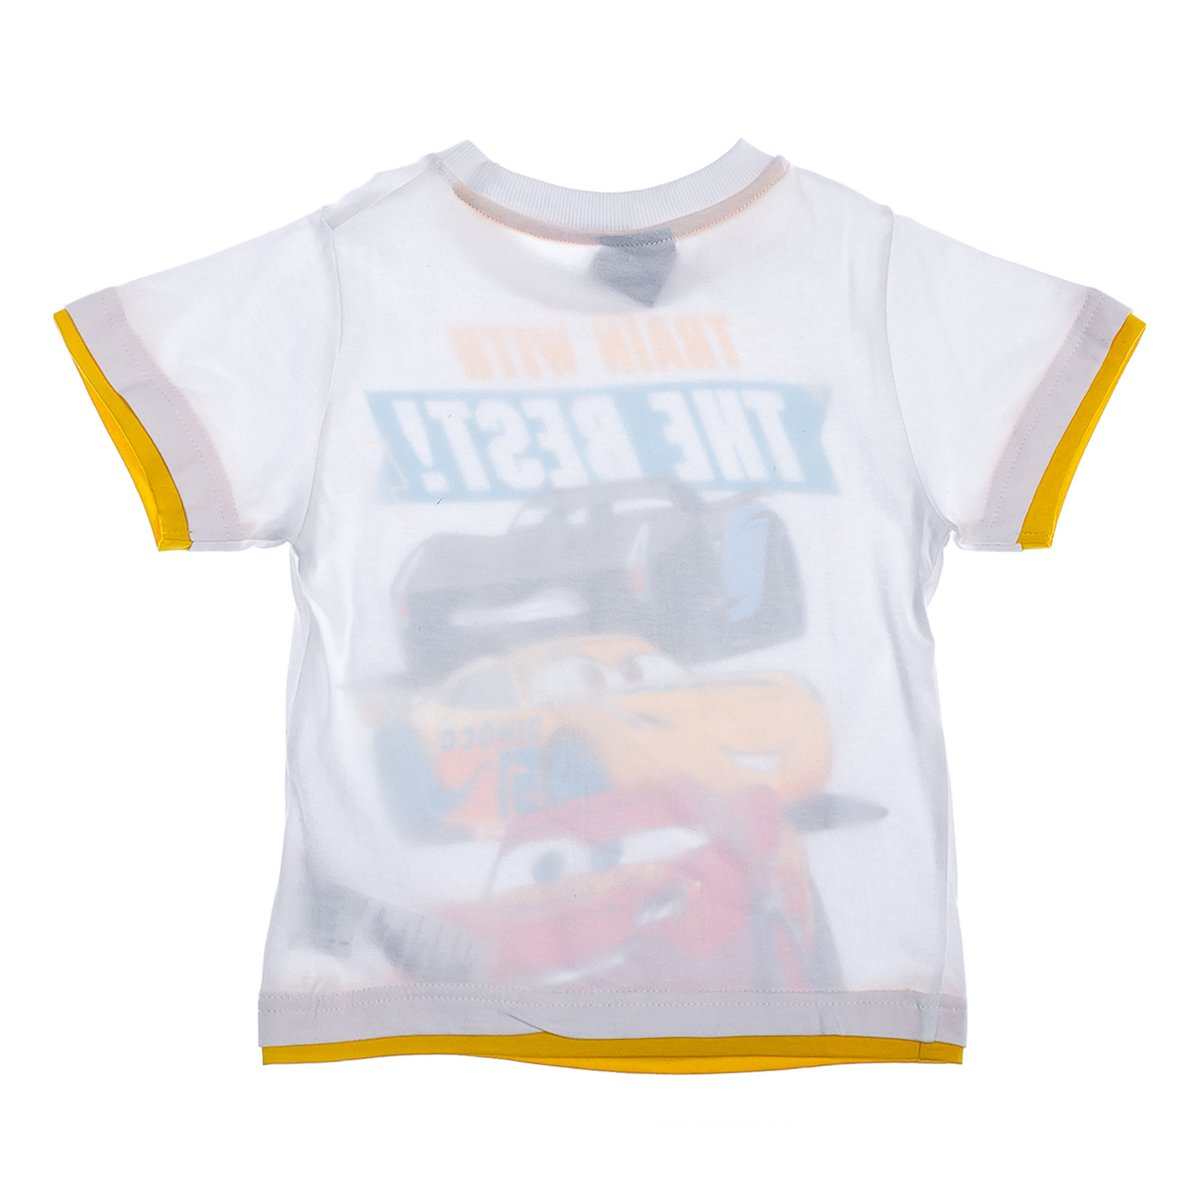 Купить Футболки, майки, топы, туники, Футболка E Plus M Cars The Best White, р. 110 DISC52026412 ТМ: E Plus M, белый